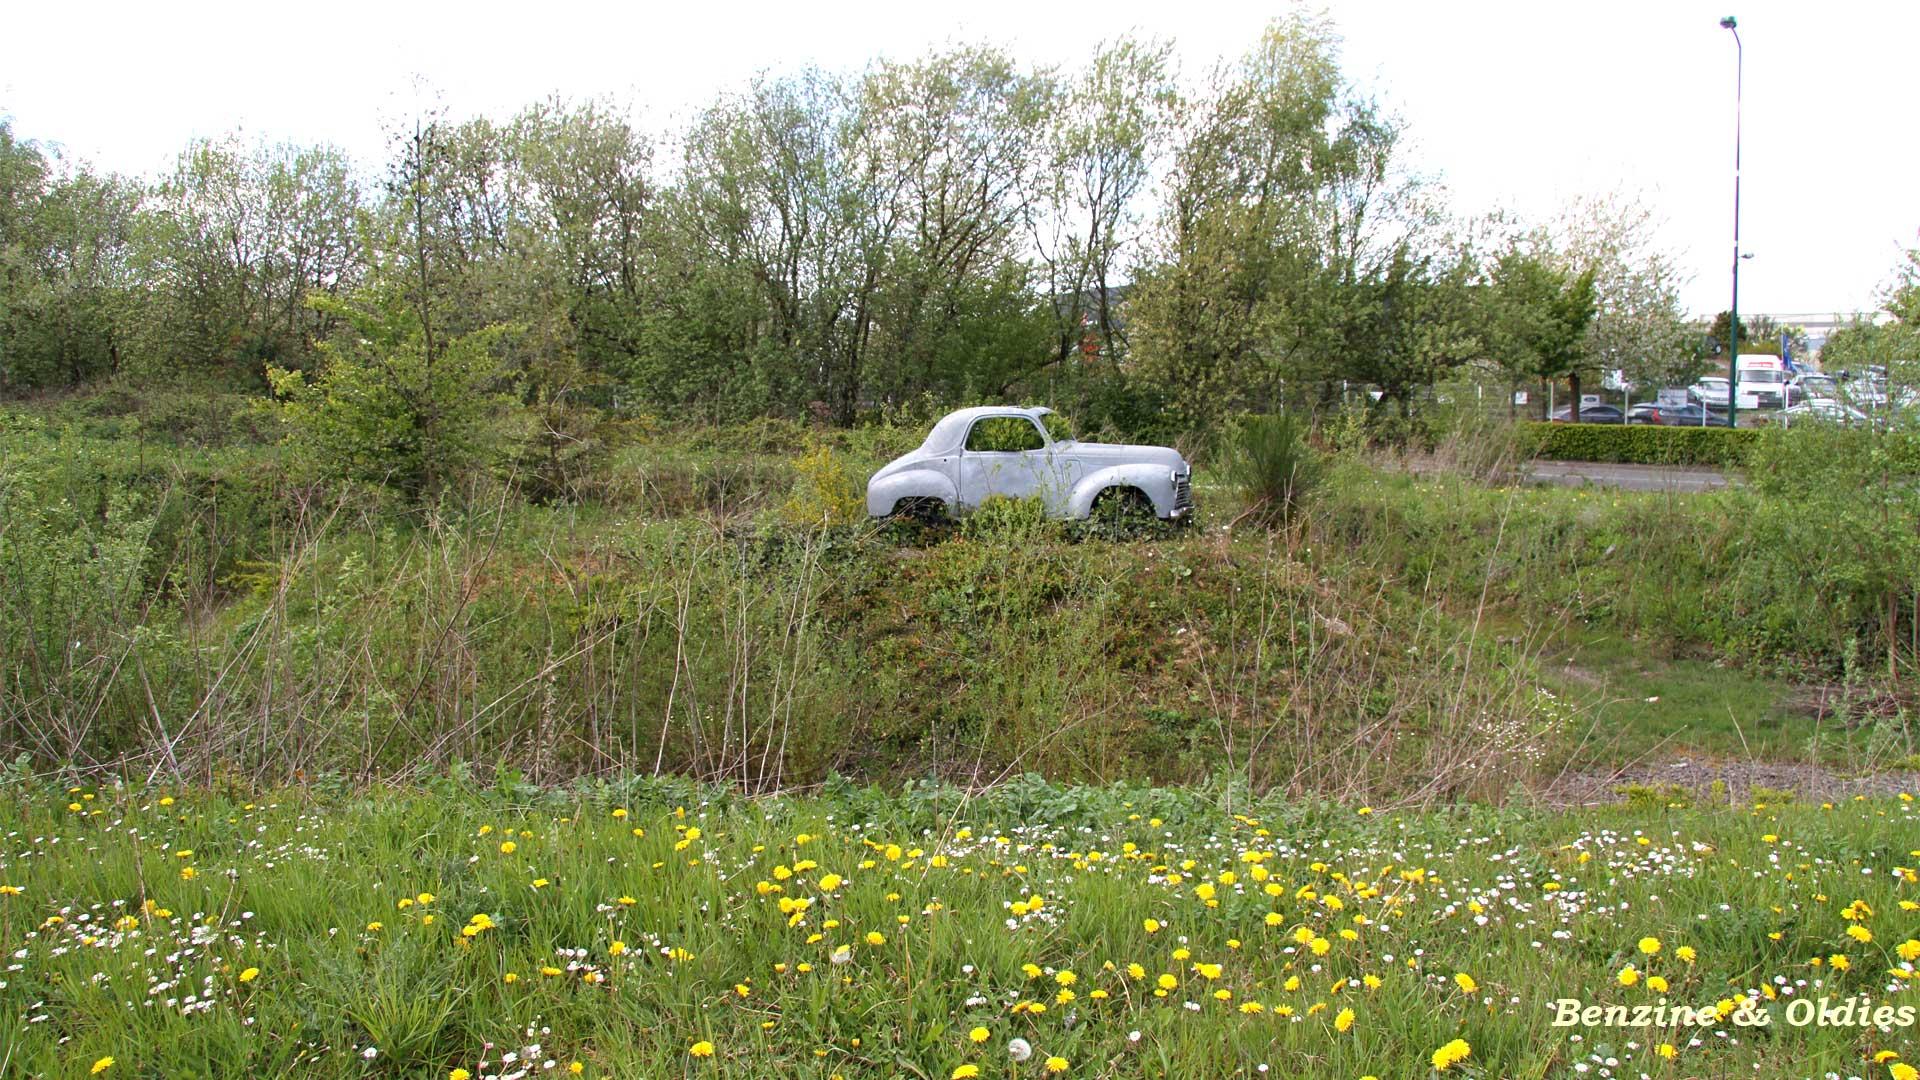 une Simca 6 carrosserie aluminium oubliée dans la nature - Simca6 166828simca6street01w19201080